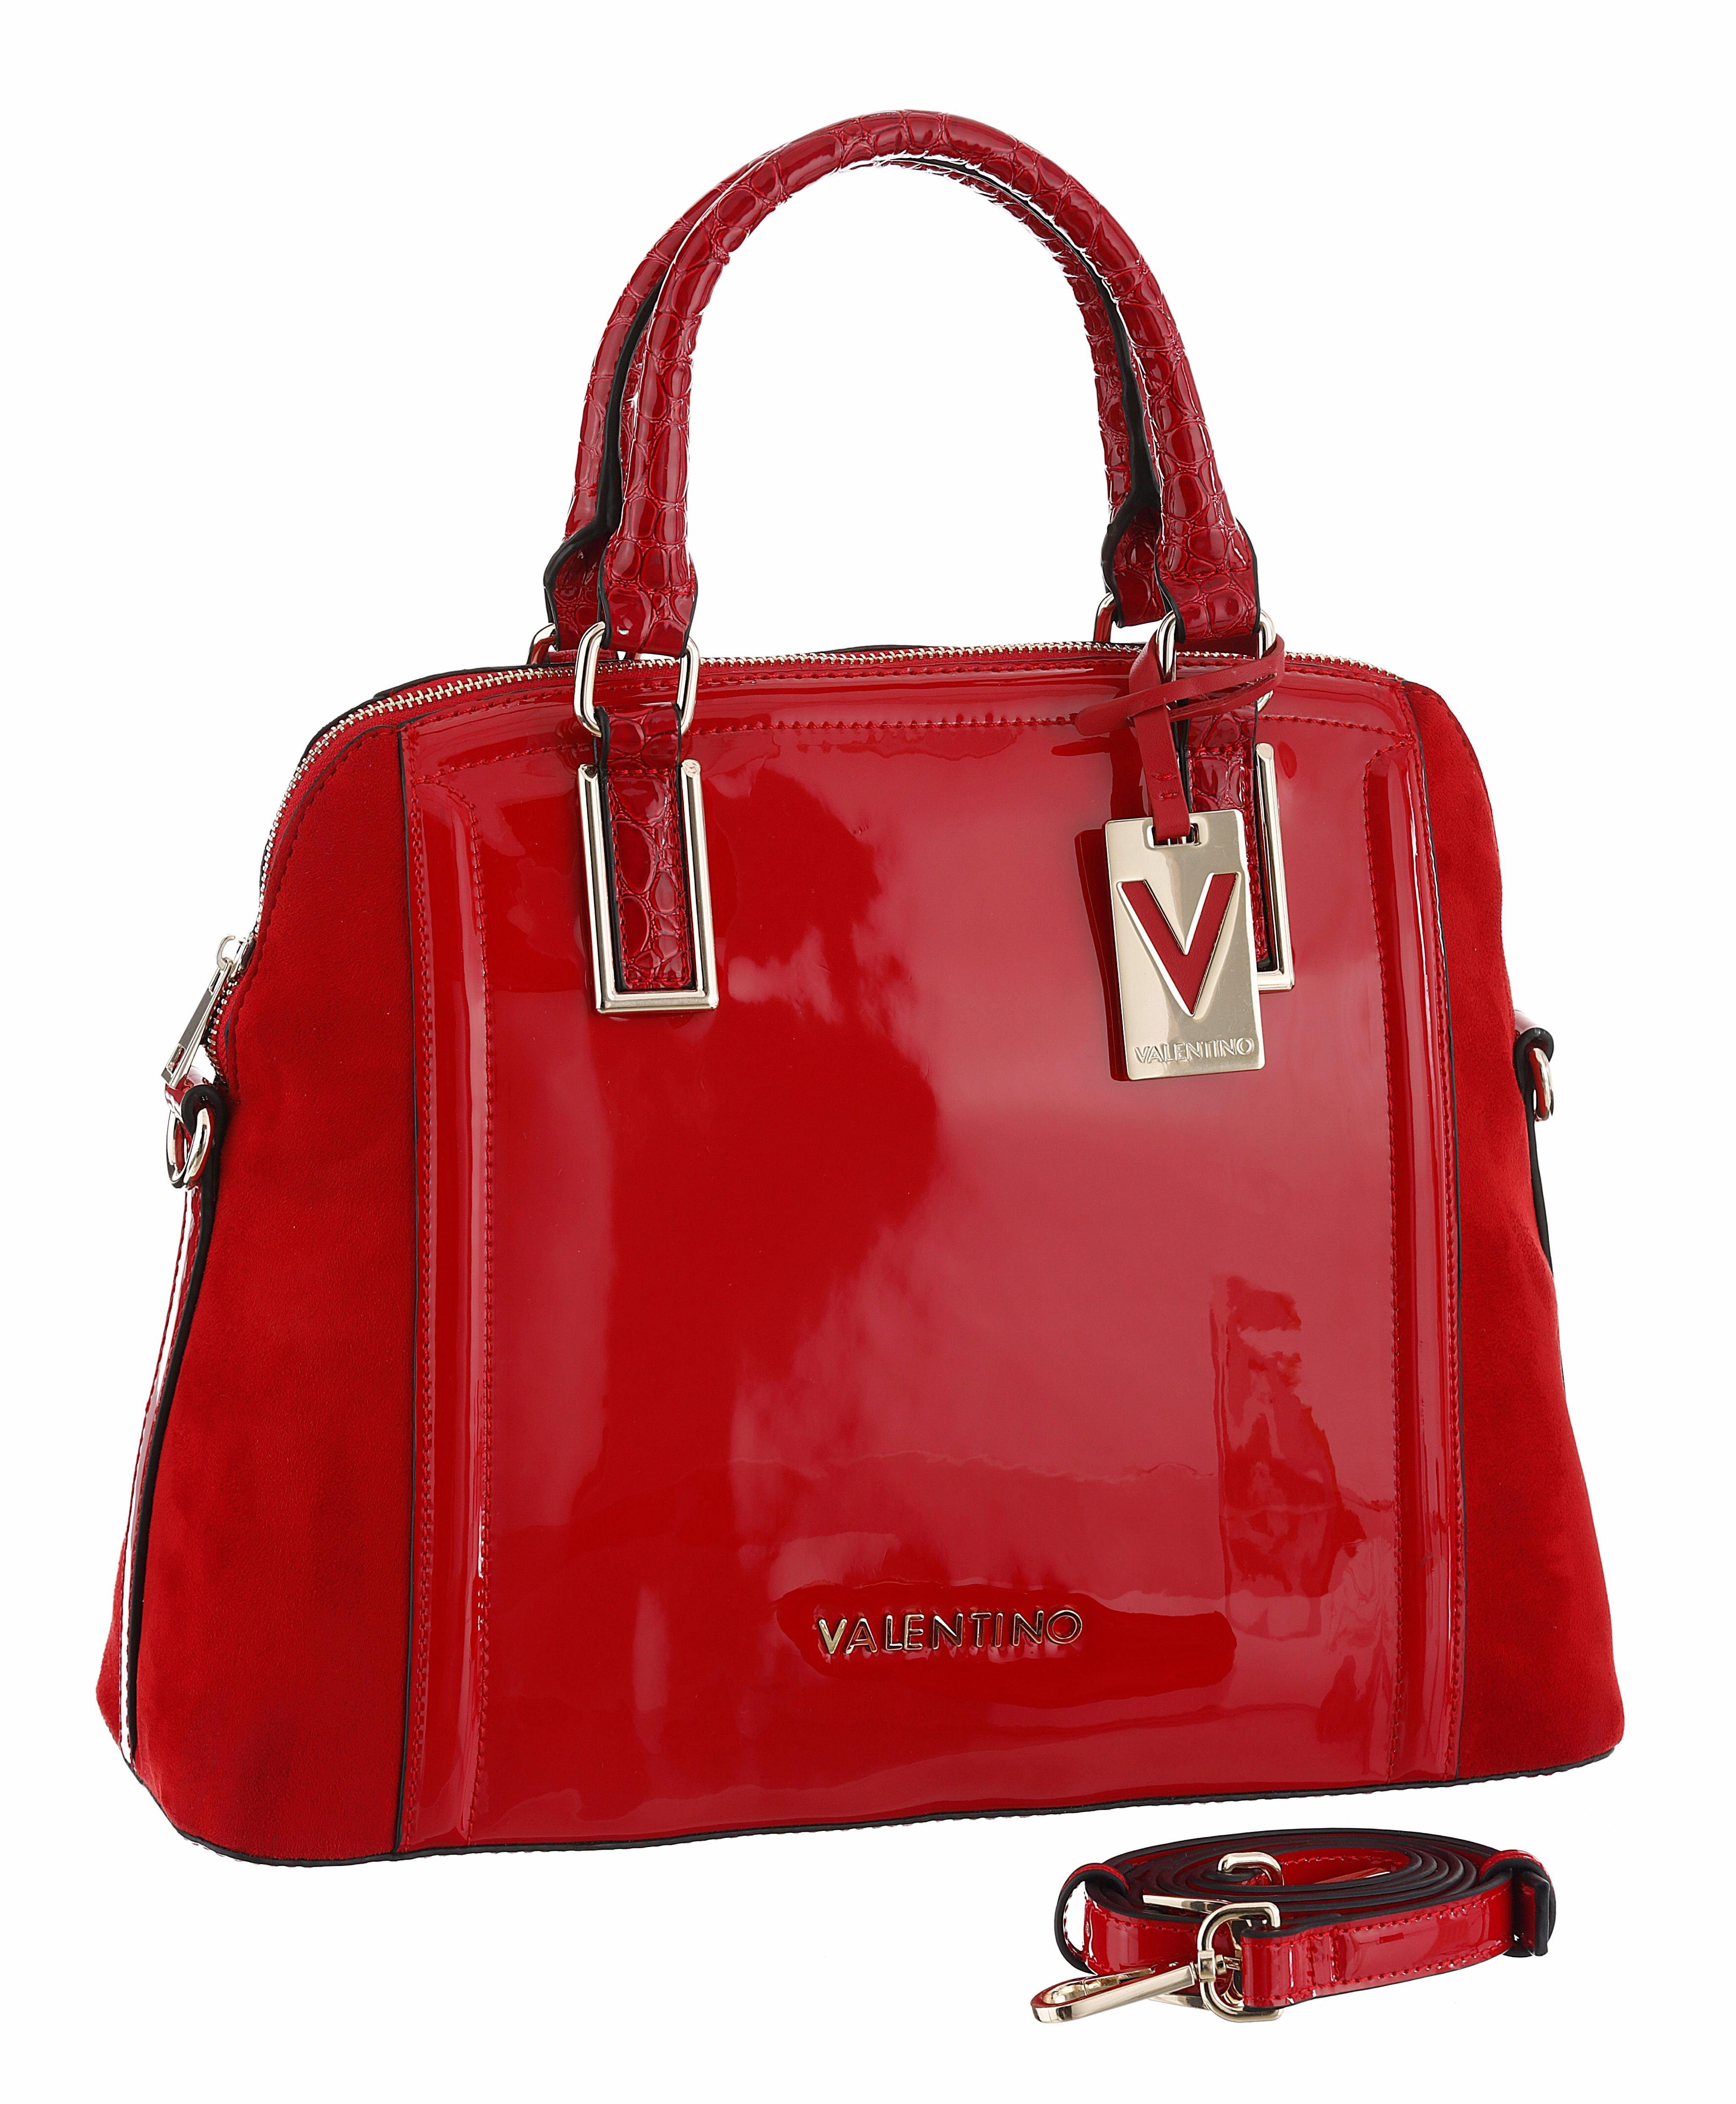 Valentino handbags Henkeltasche, im Lack Look